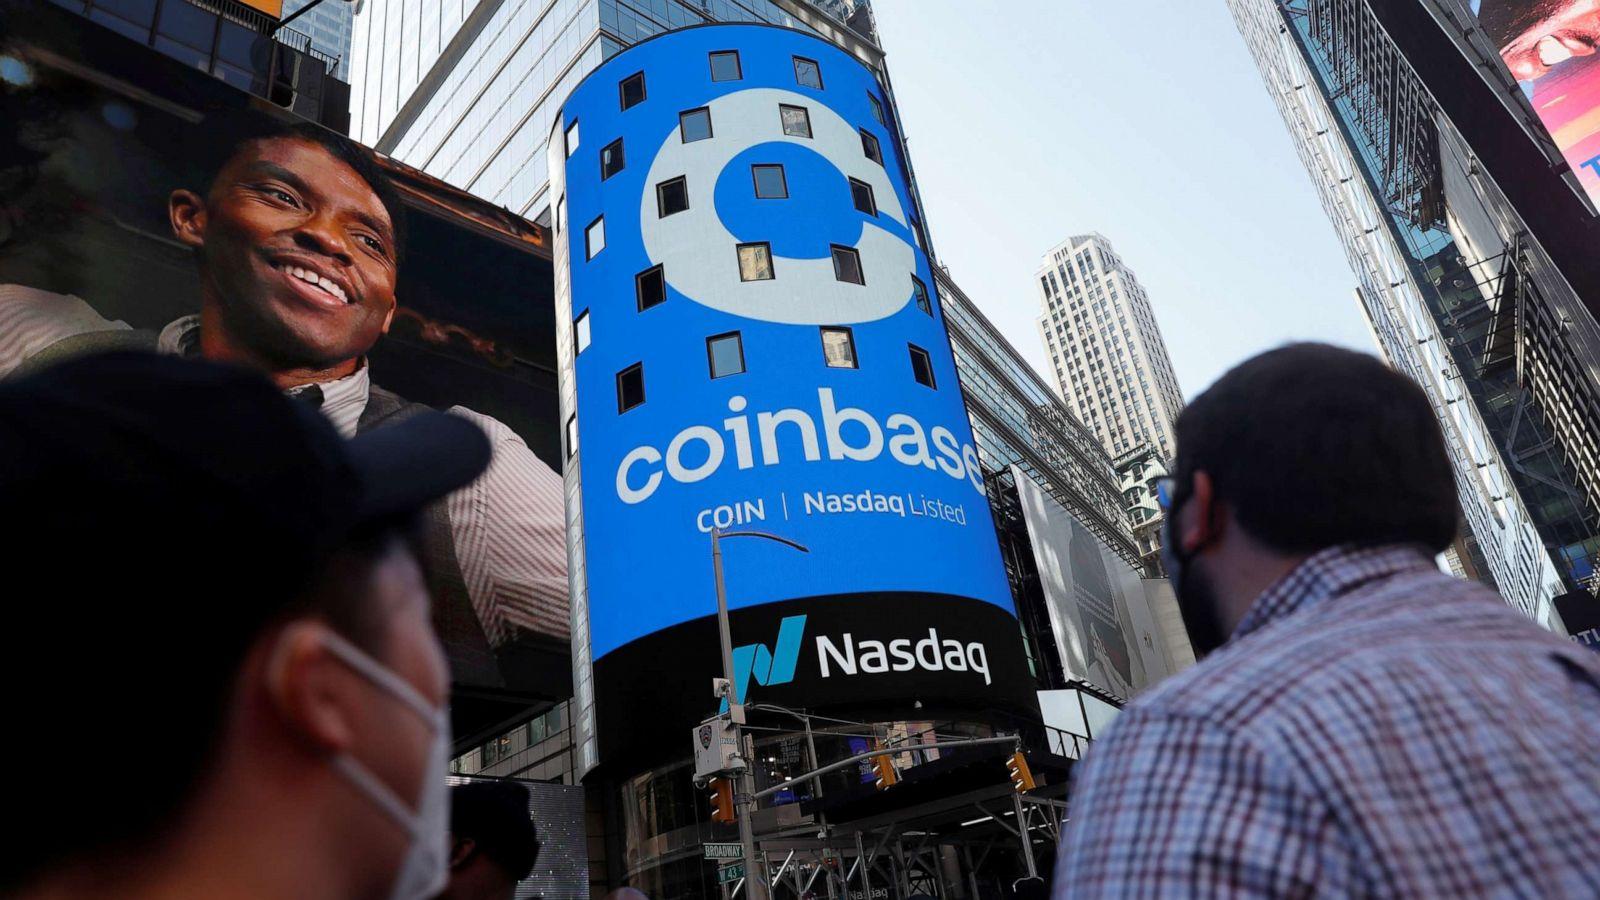 Coinbase Cryptocurrencies